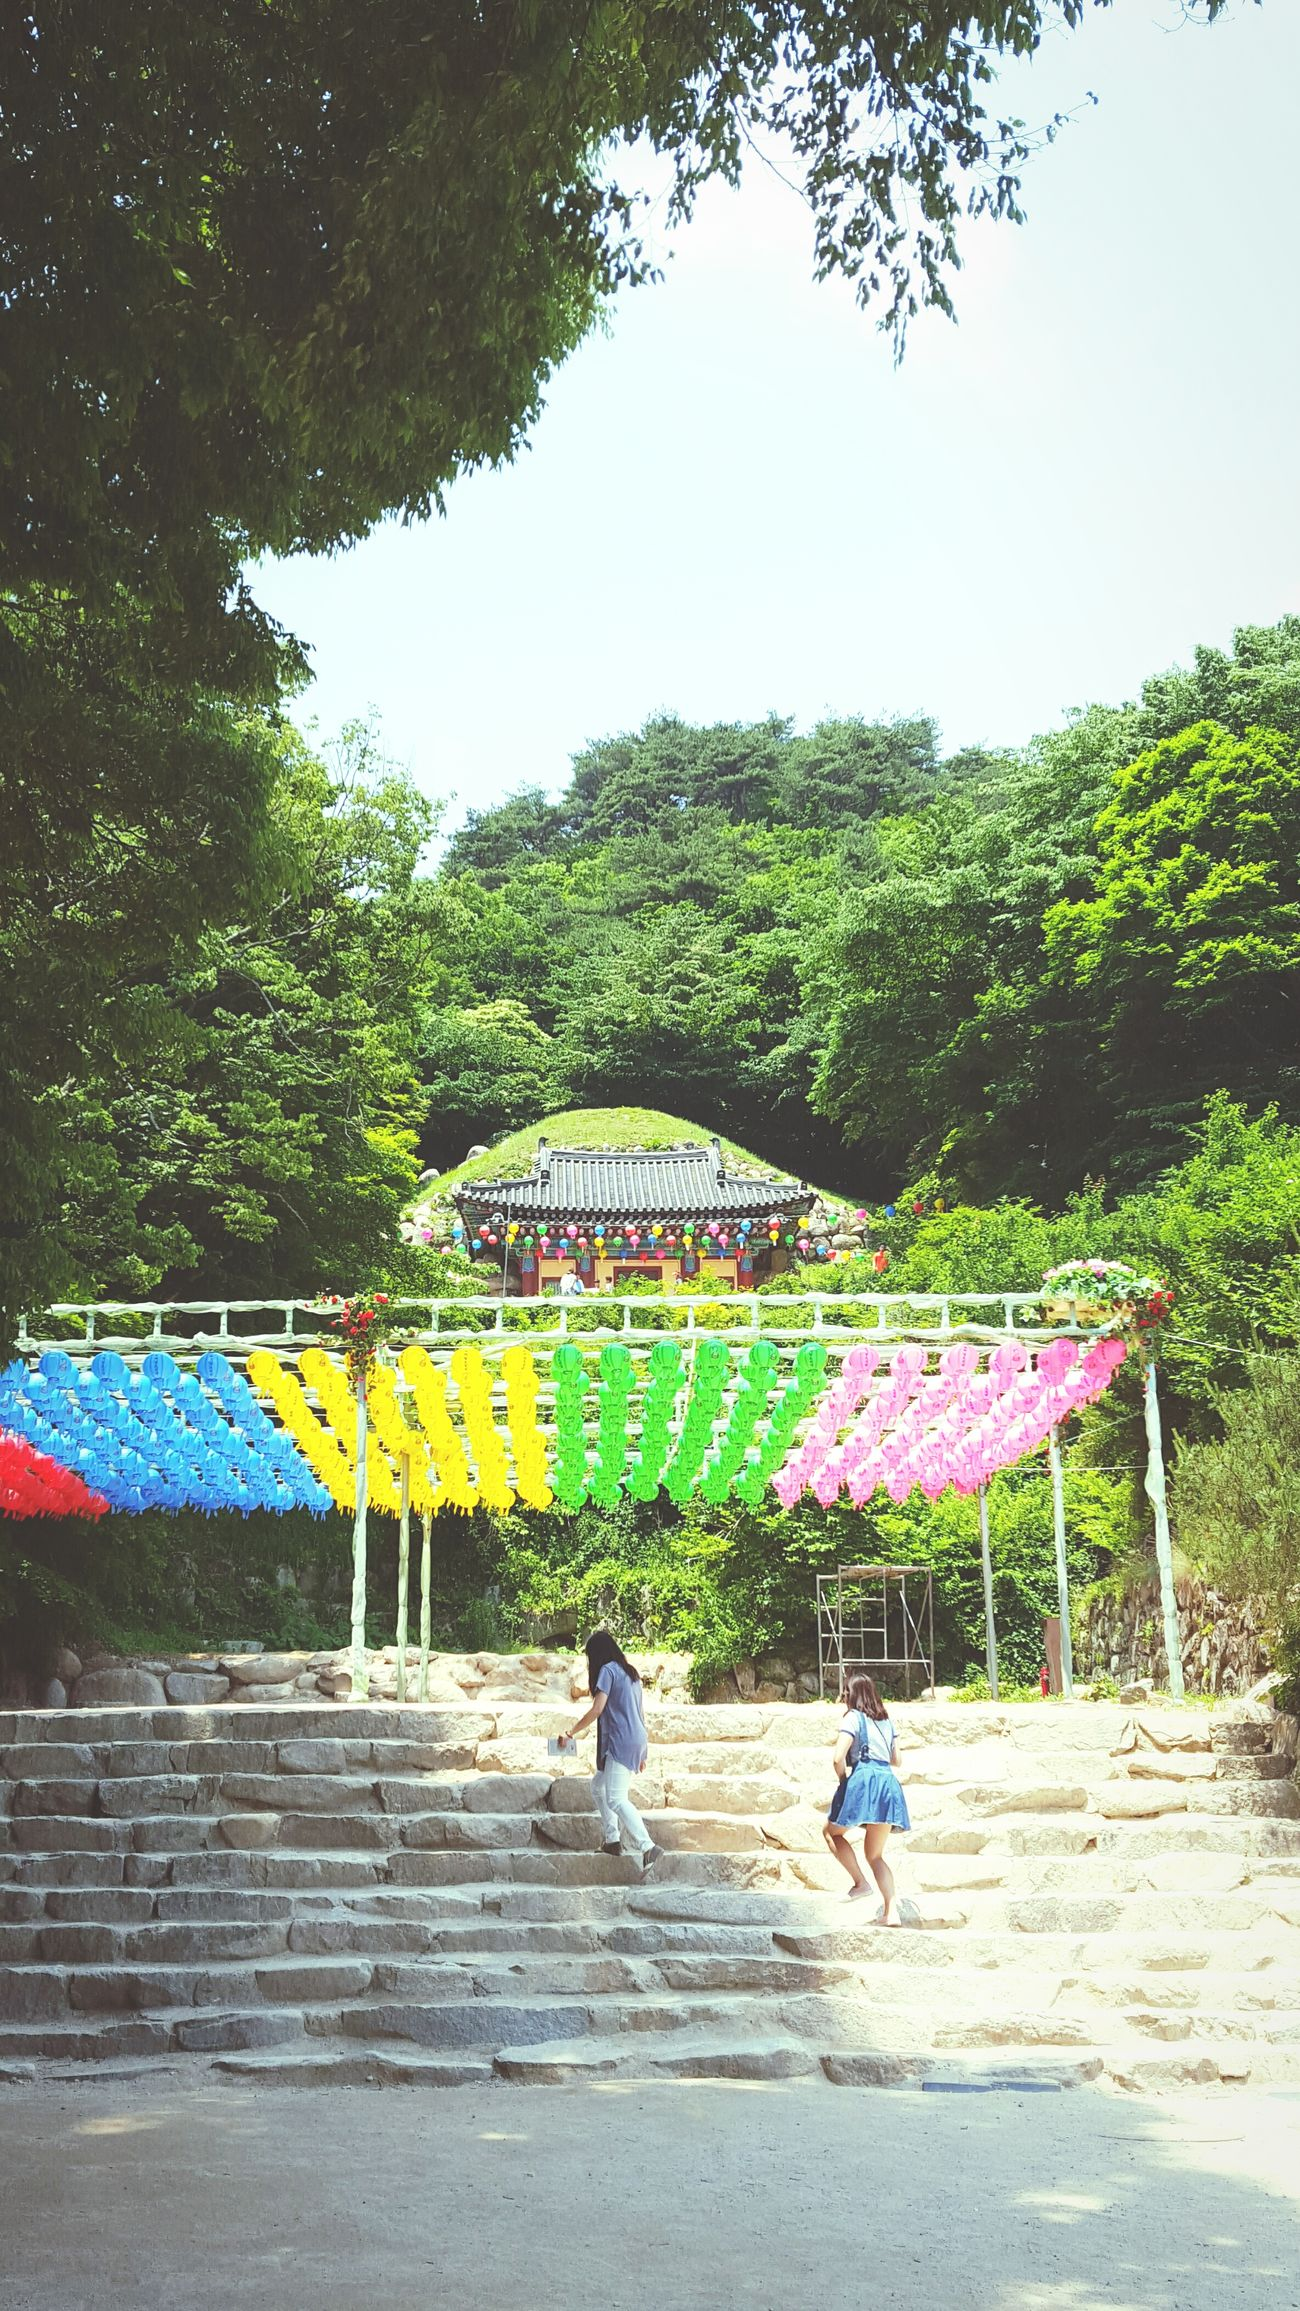 Gyeongju 경주 Seokguram 석굴암